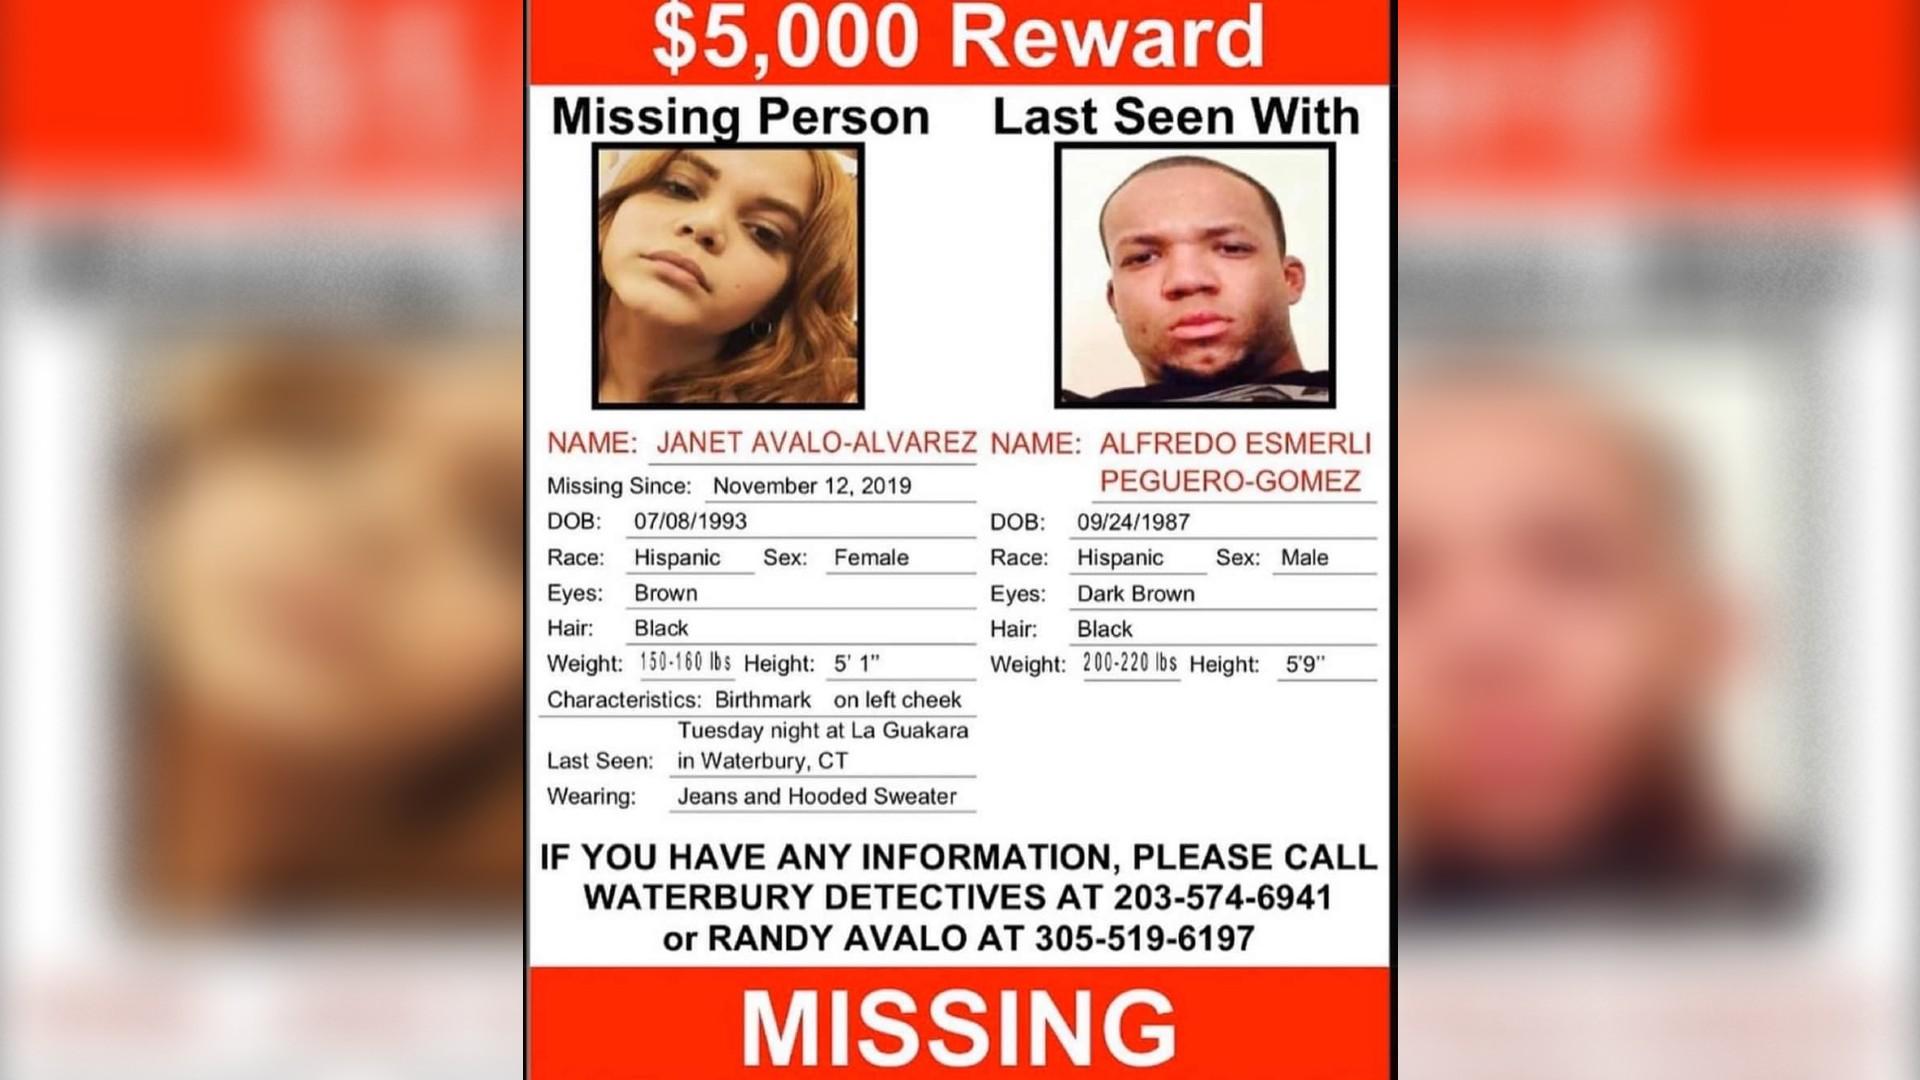 Waterbury Night Club Owner And Boyfriend Missing